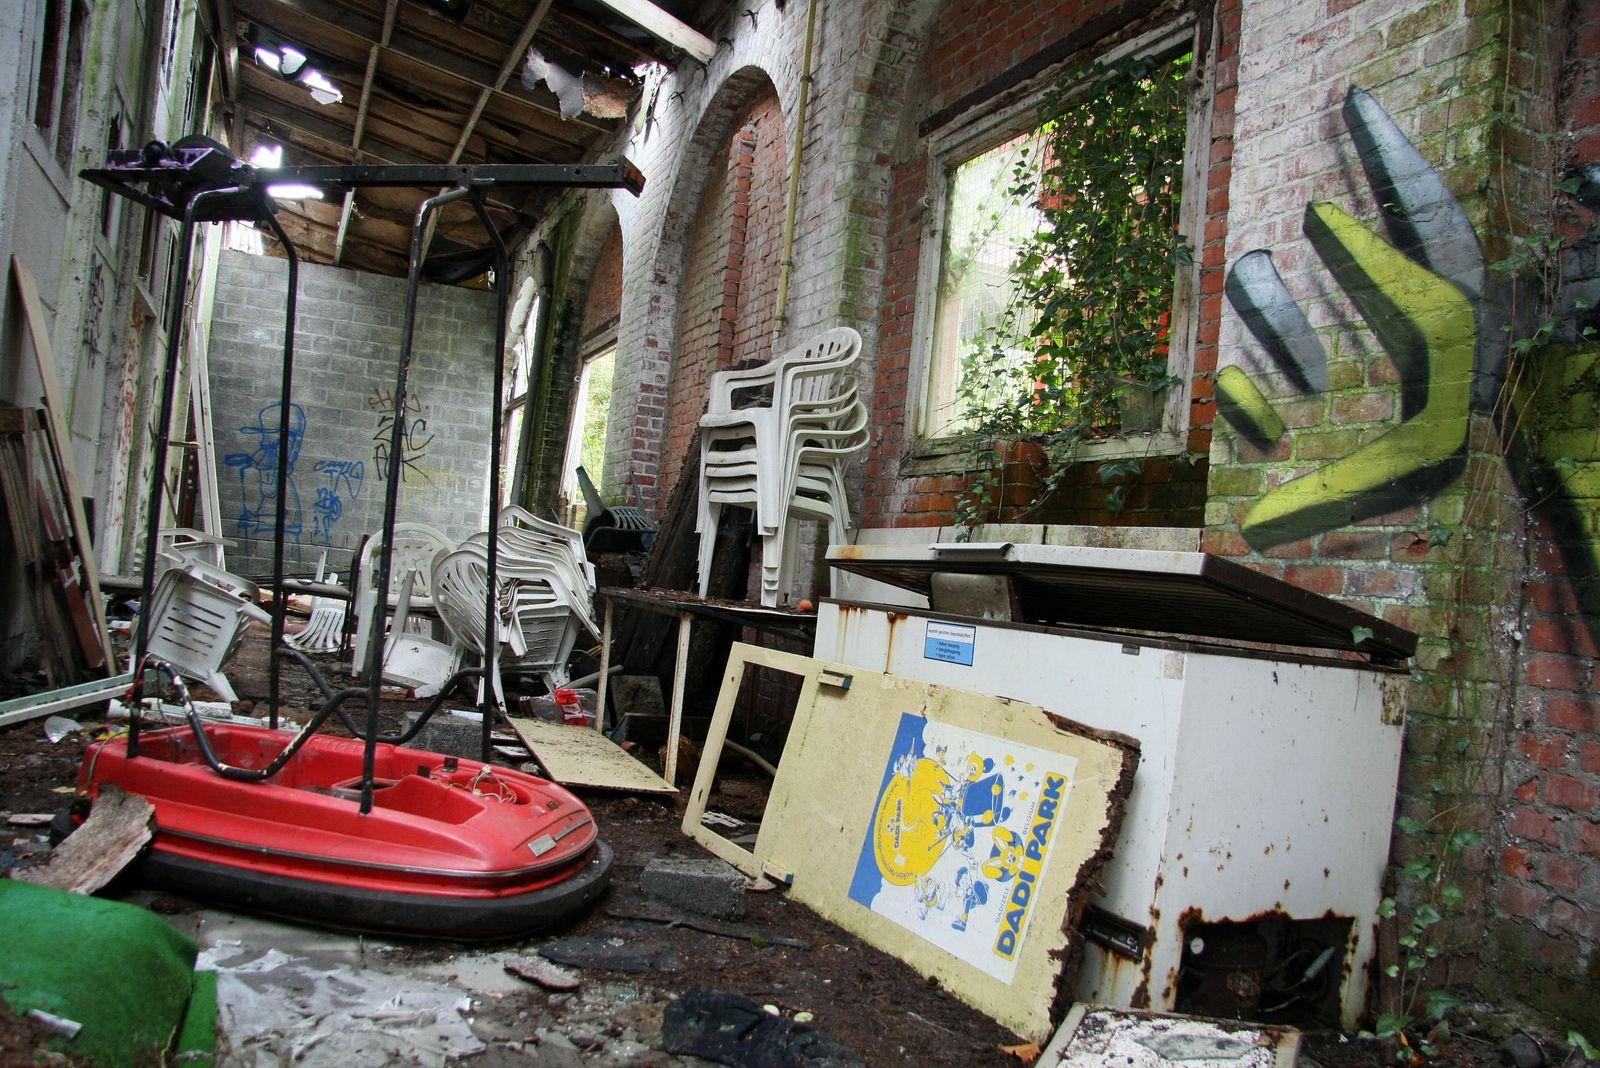 Dadipark Belgium Abandoned Theme Parks Abandoned Amusement Parks Belgium